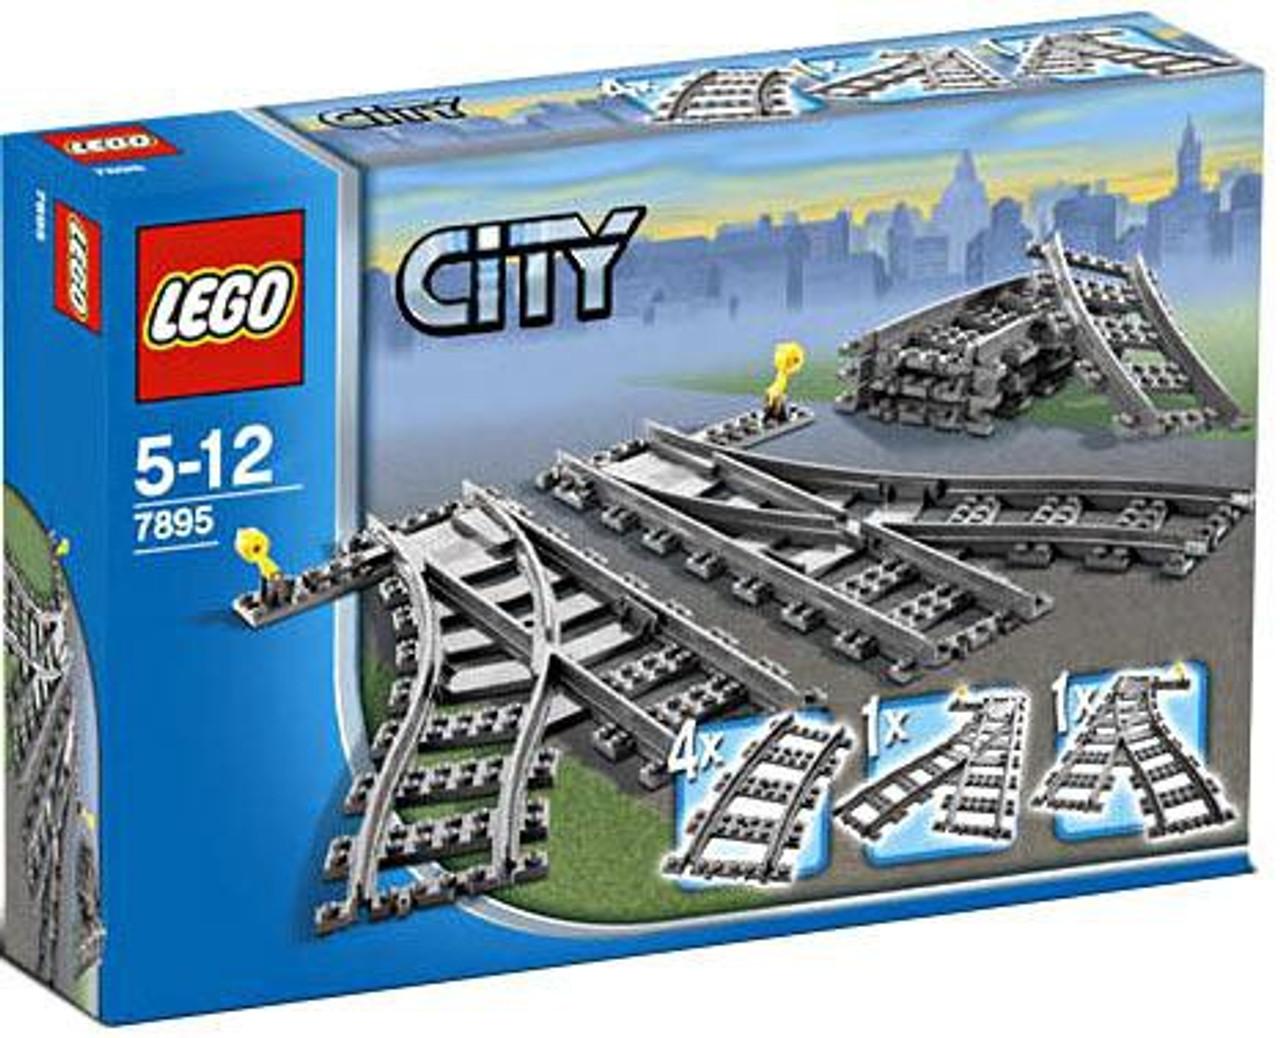 LEGO City Switch Tracks Set #7895